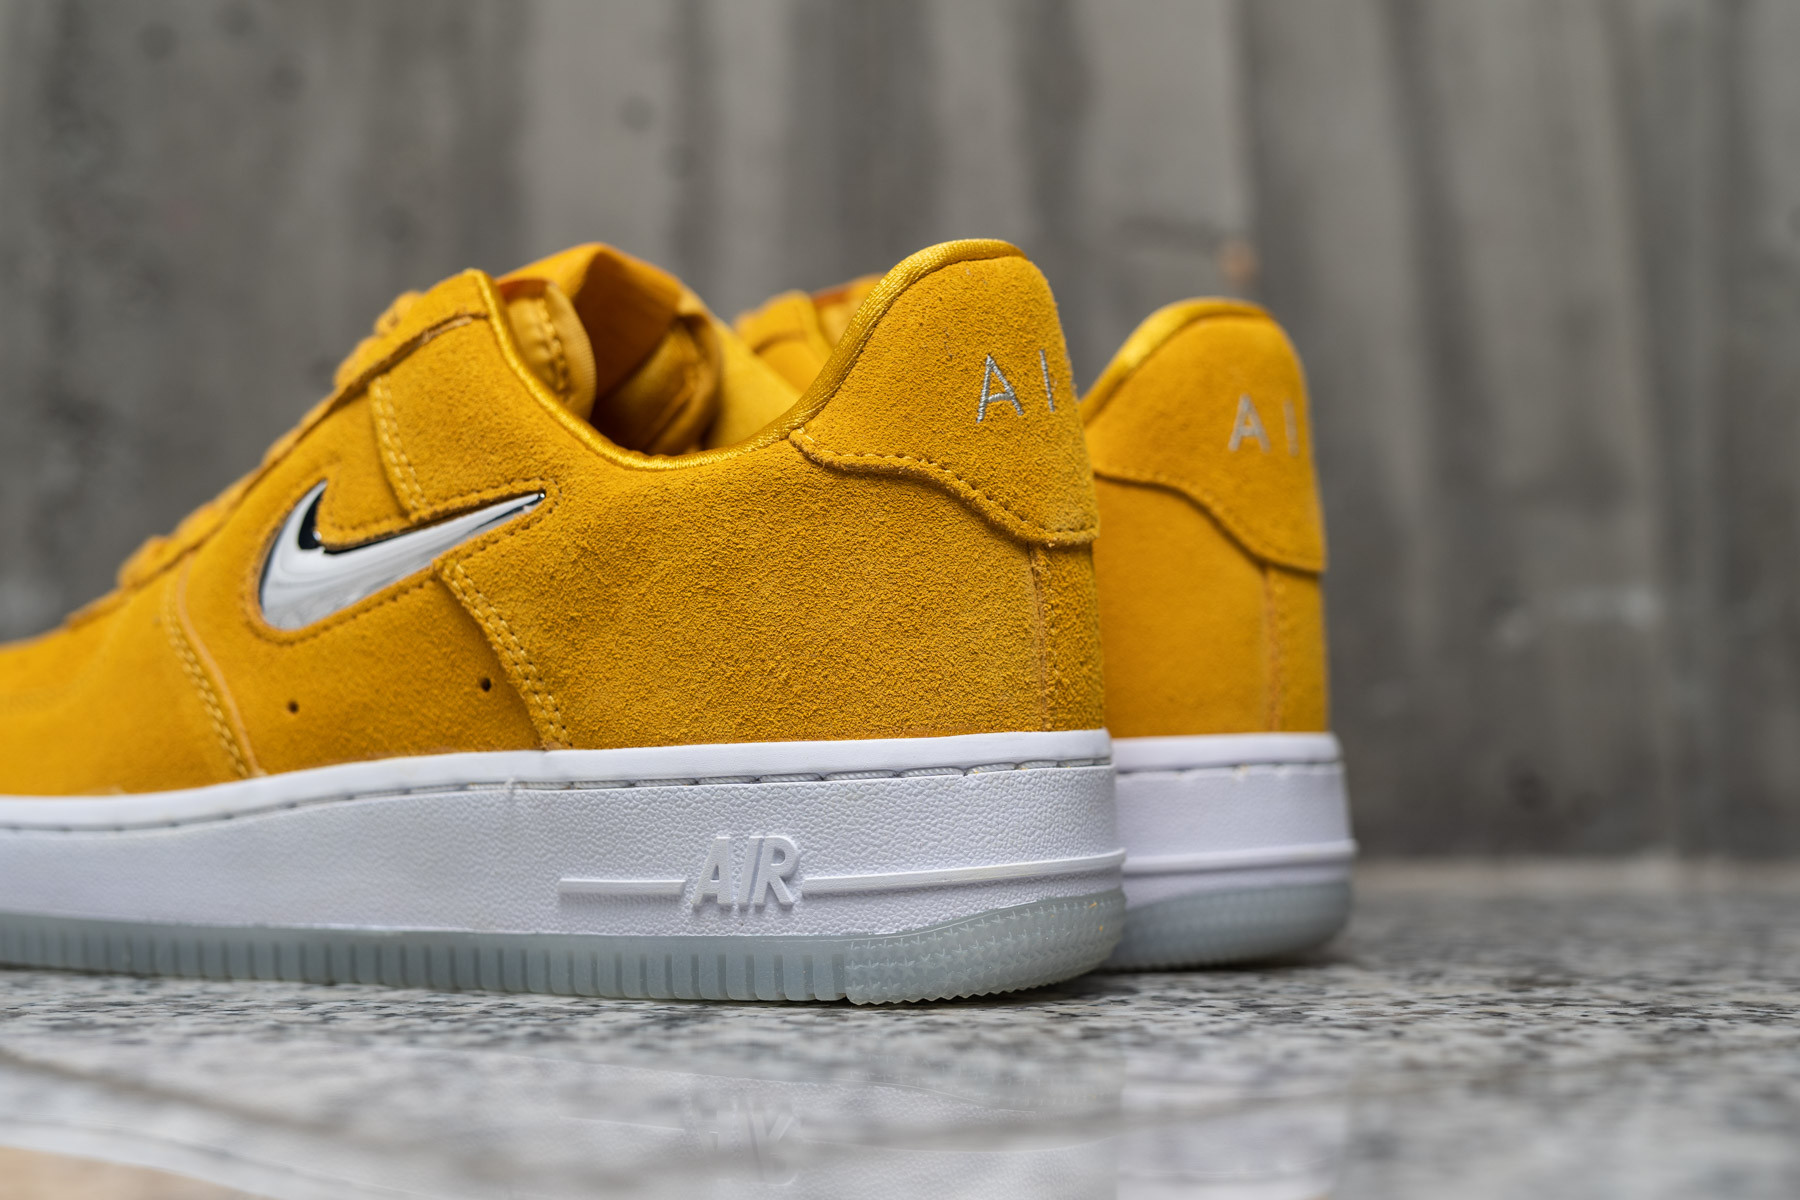 Nike Air Force 1 Low Jewel Yellow Ochre AO3814 700 Sneaker